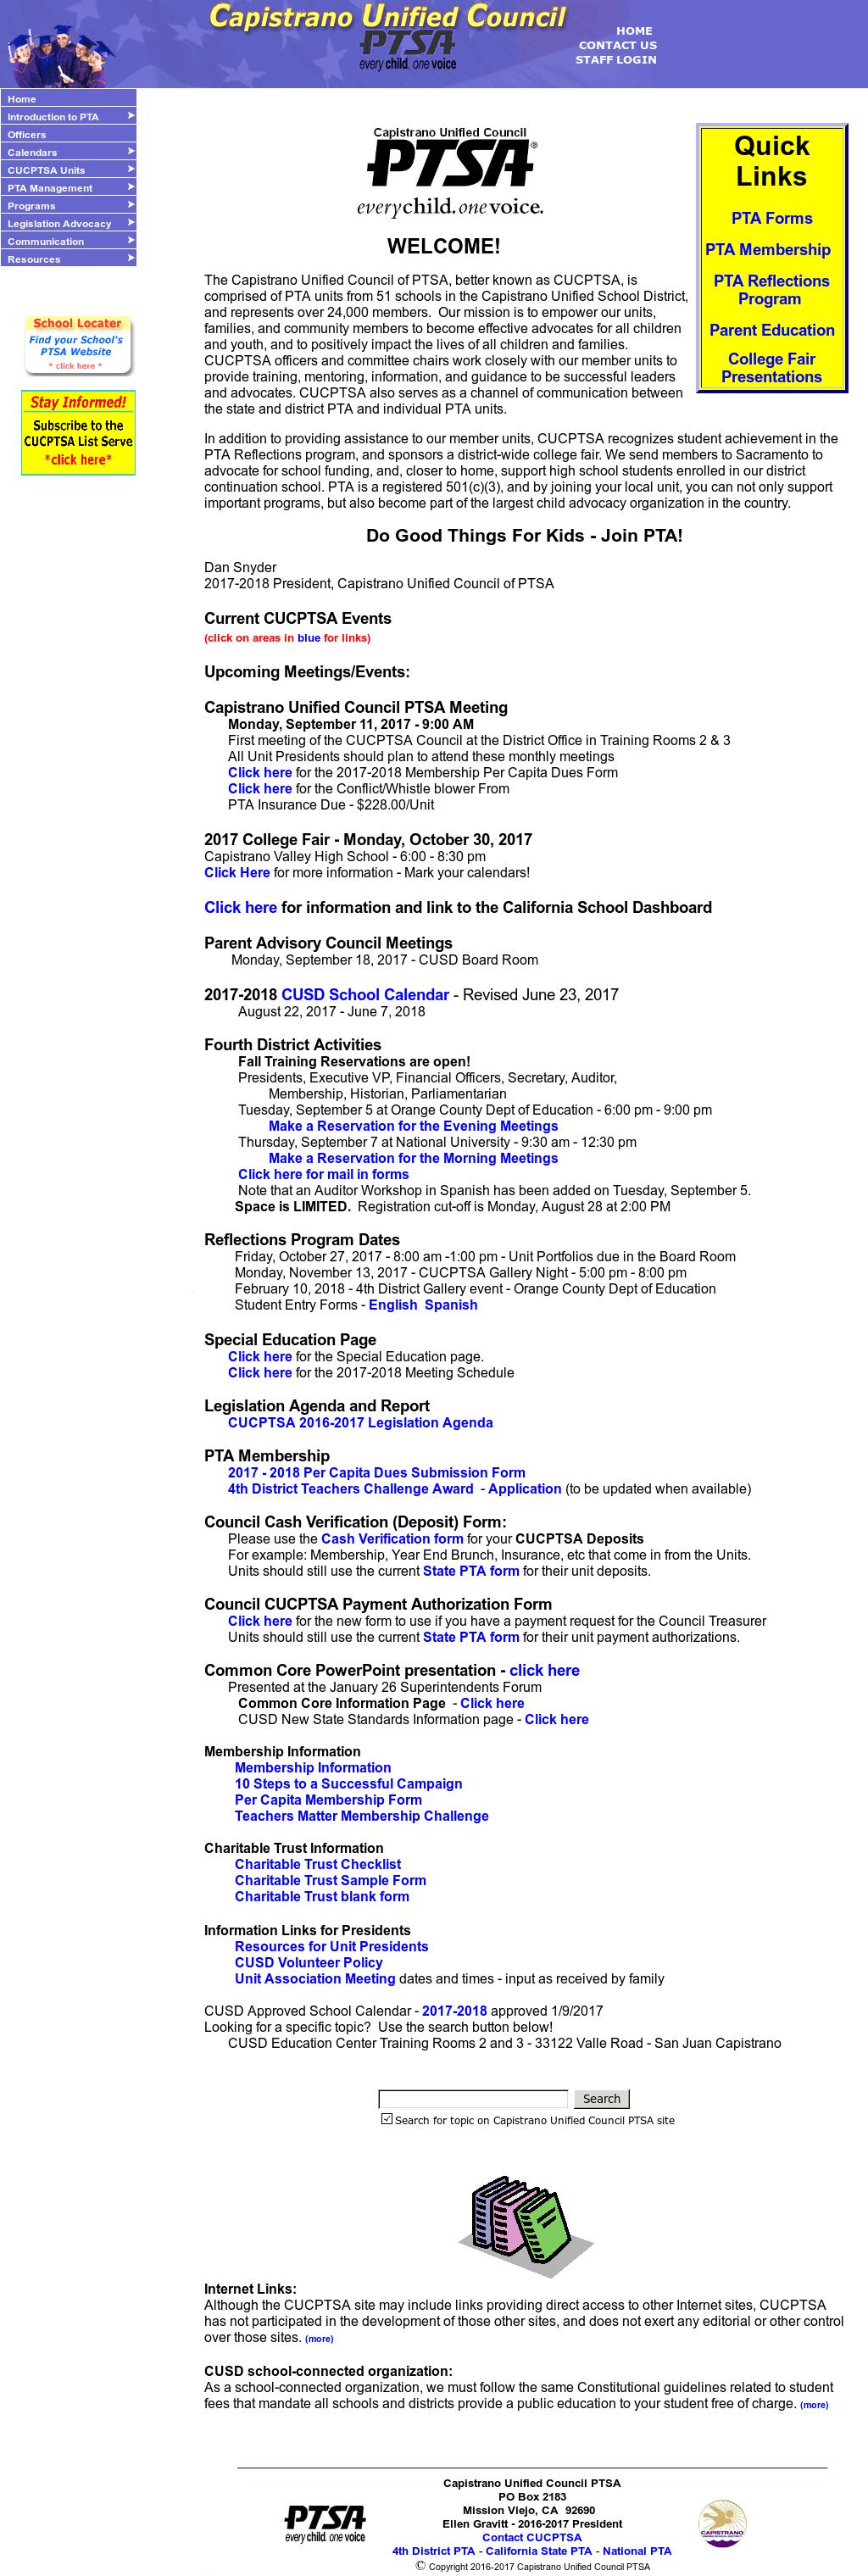 Capistrano Unified Council Ptsa Competitors, Revenue and